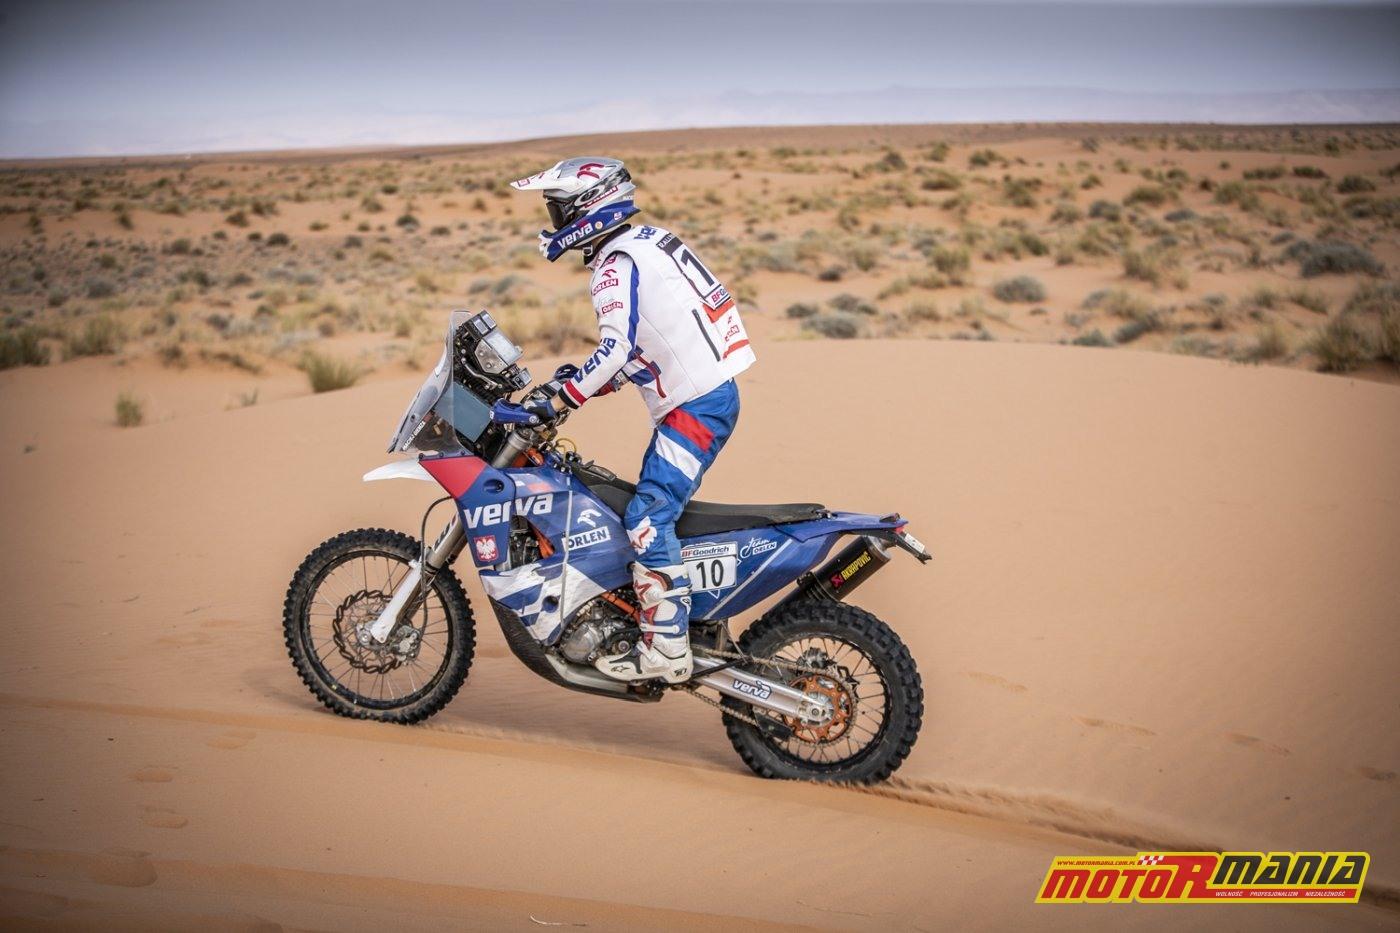 ORLEN_Team_Giemza Maroko finisz 1